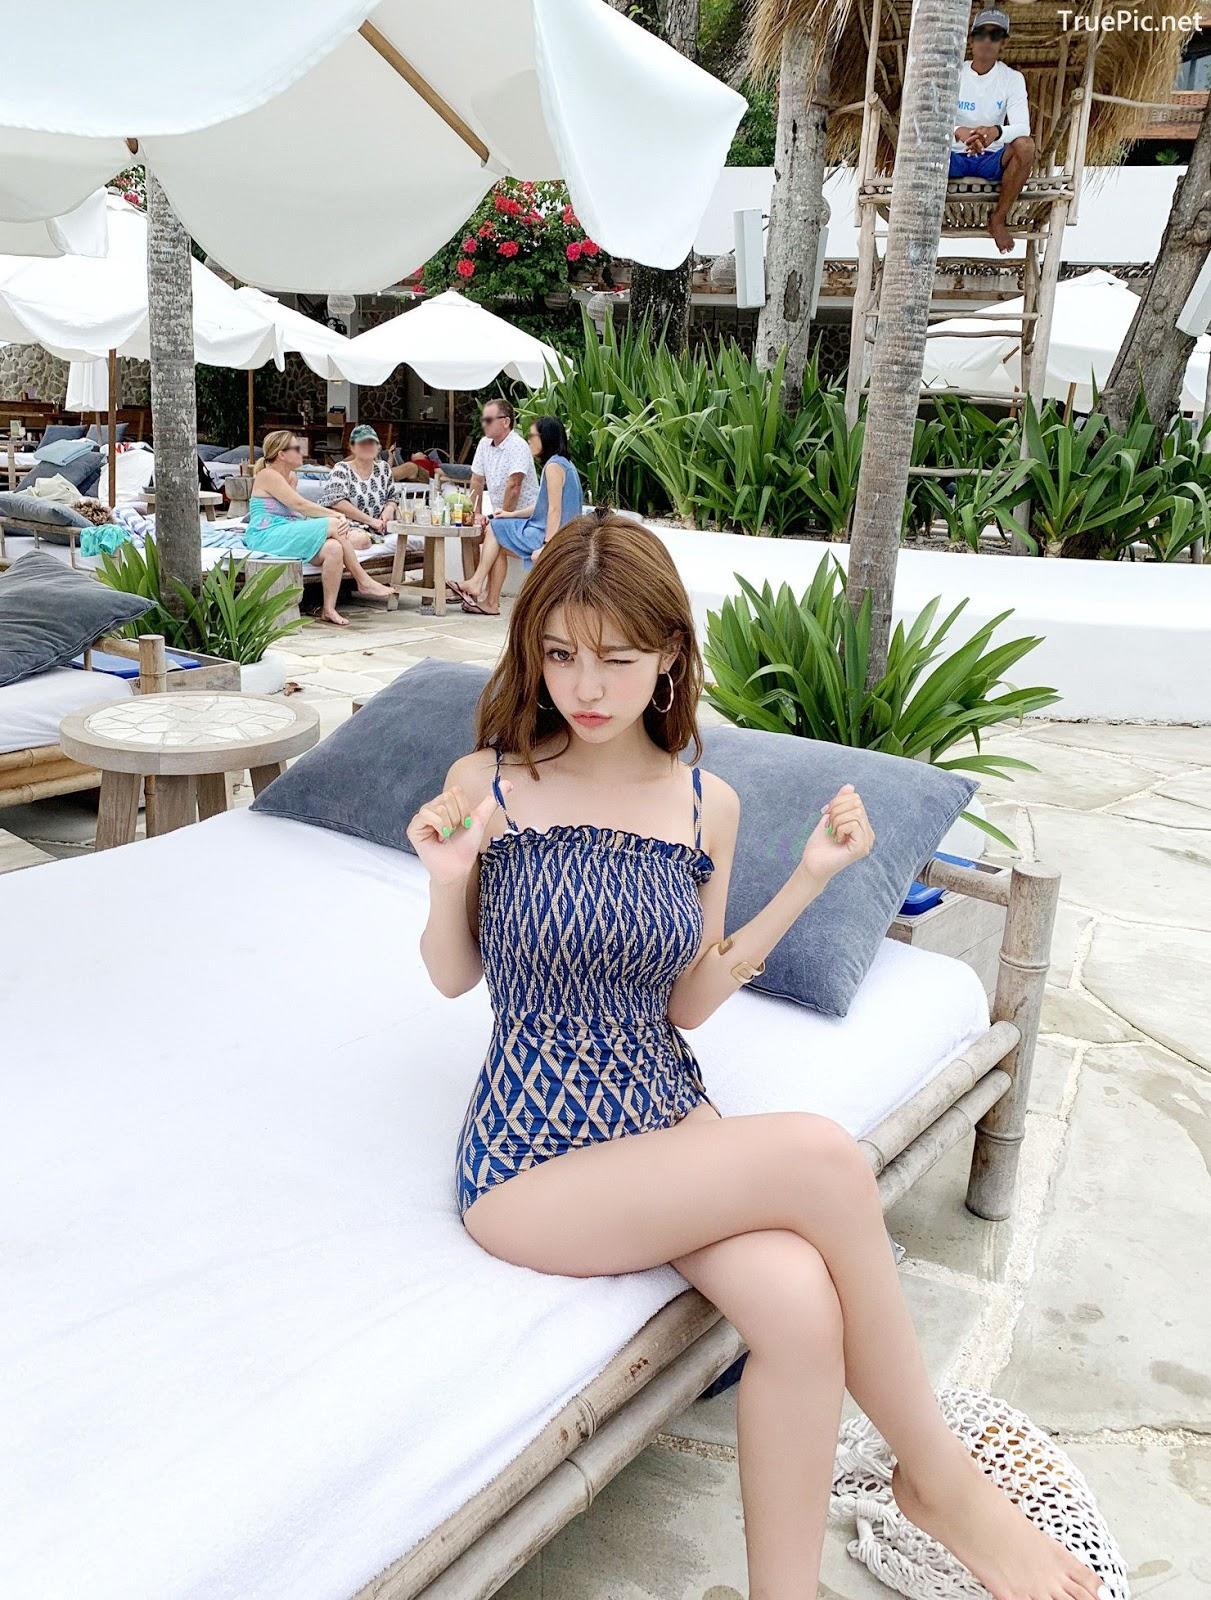 Image Korean Fashion Model - Cha Yoo Jin - Diamond Smoke Monokini - TruePic.net - Picture-2